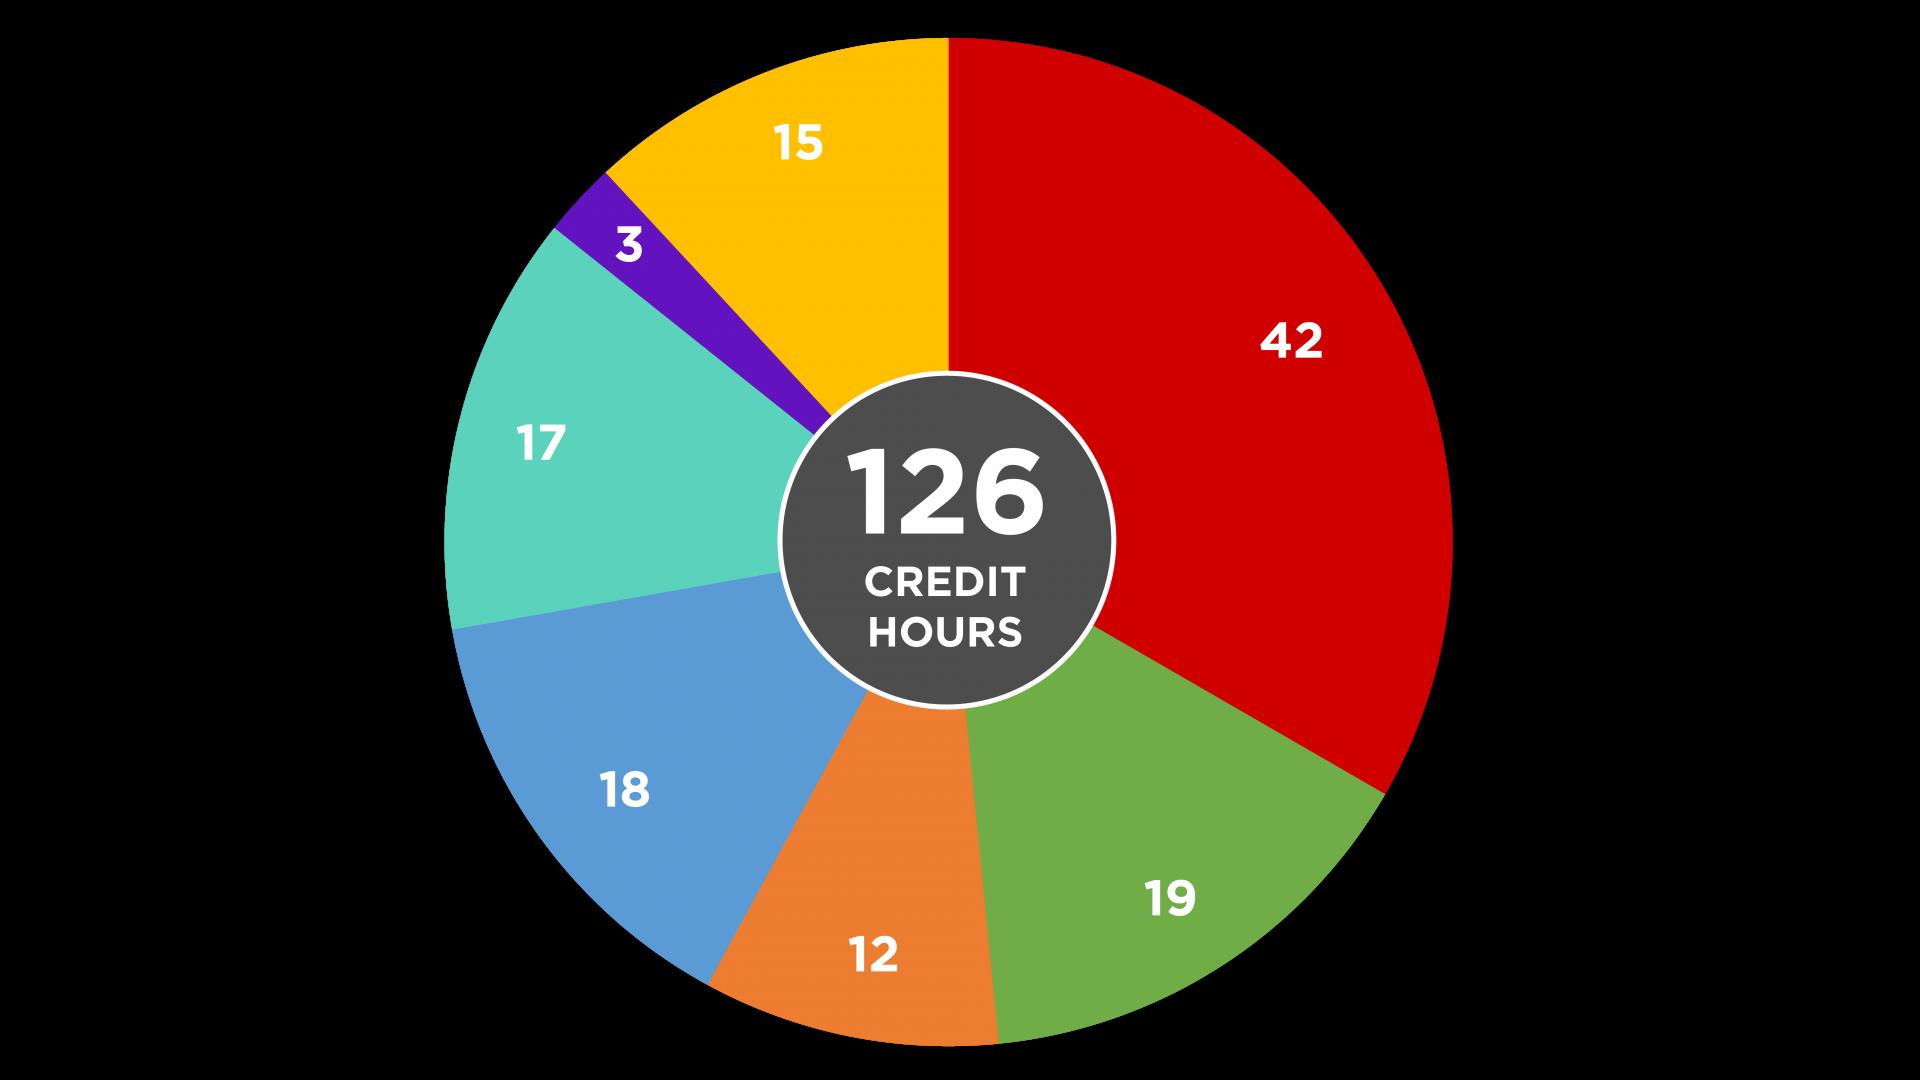 Computer Engineering Credit Hours Per Major Circle Graph